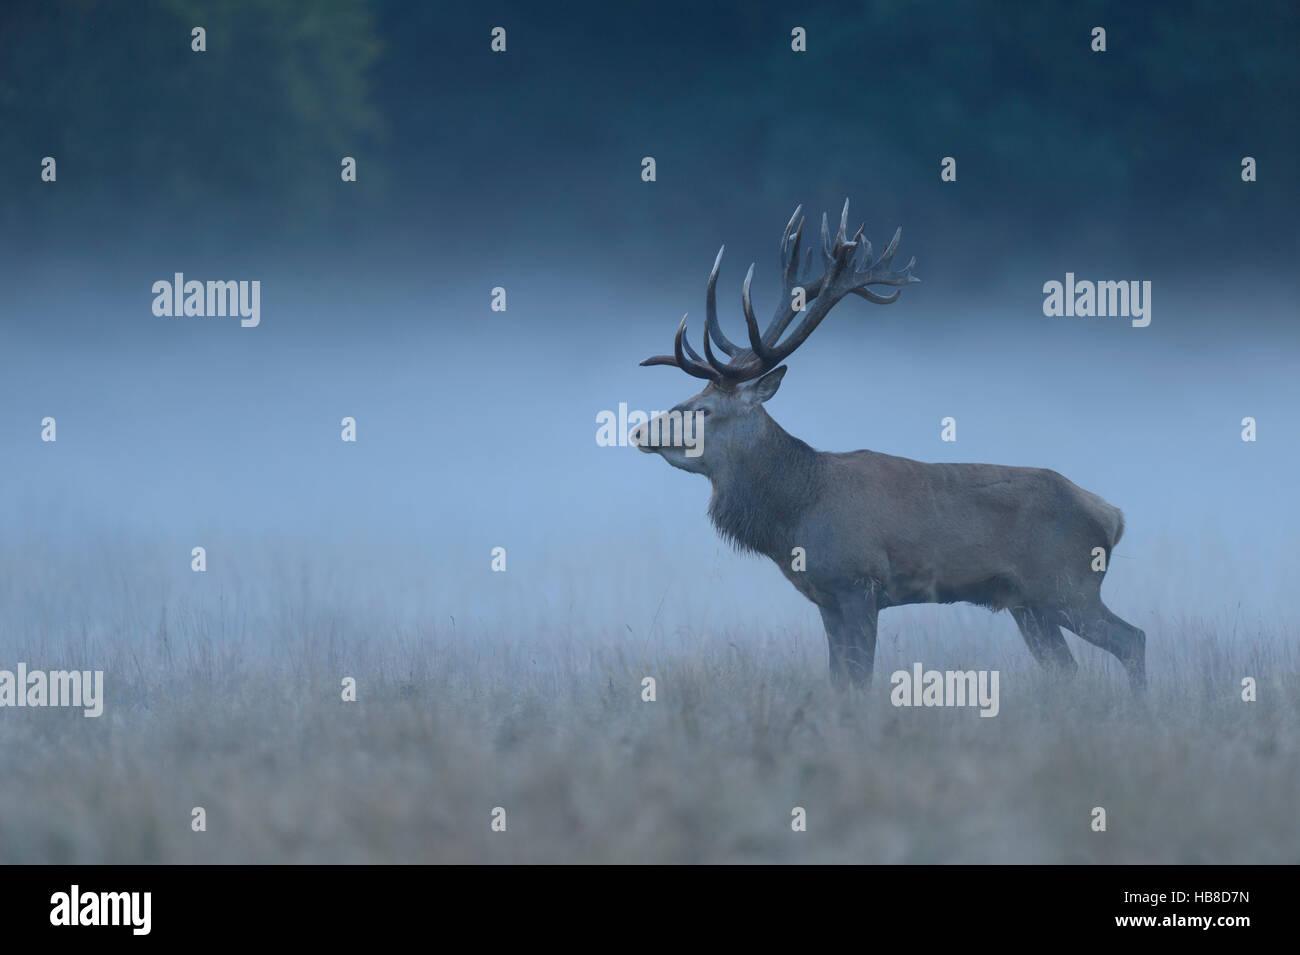 Red deer (Cervus elaphus), buck, foggy meadow, Jägersborg, Denmark - Stock Image